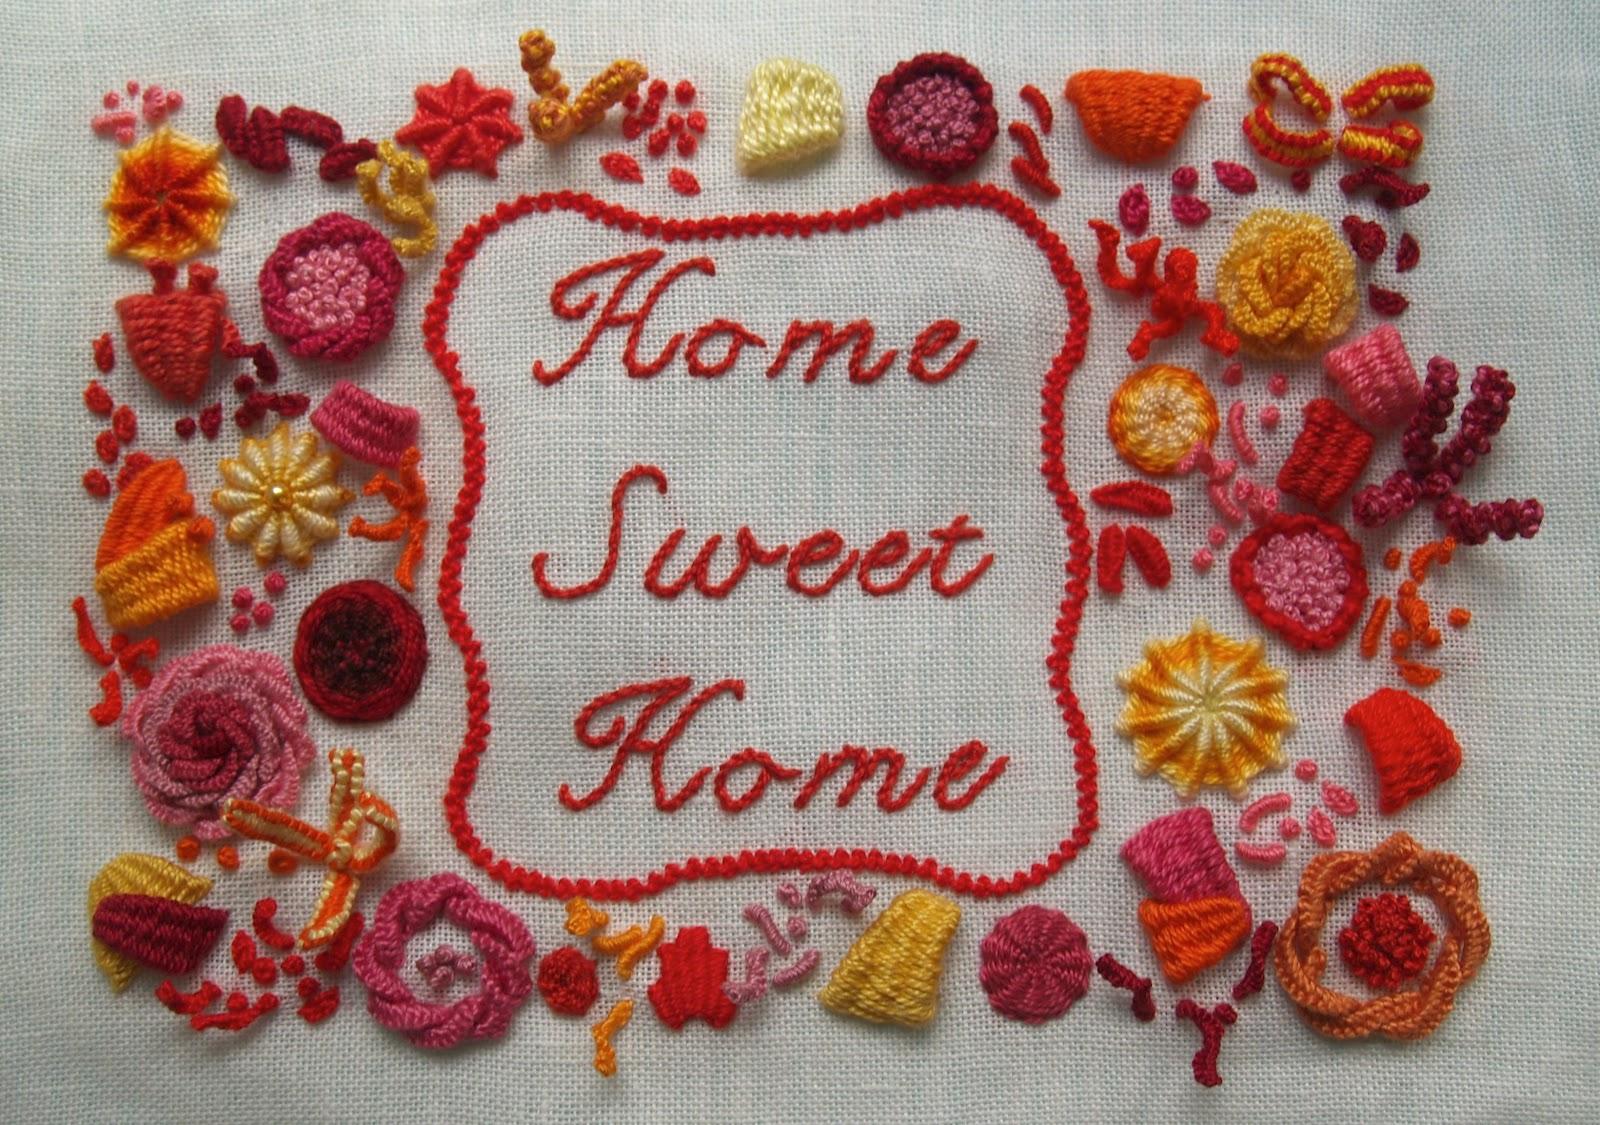 Tredimensionelt Home Sweet Home broderi